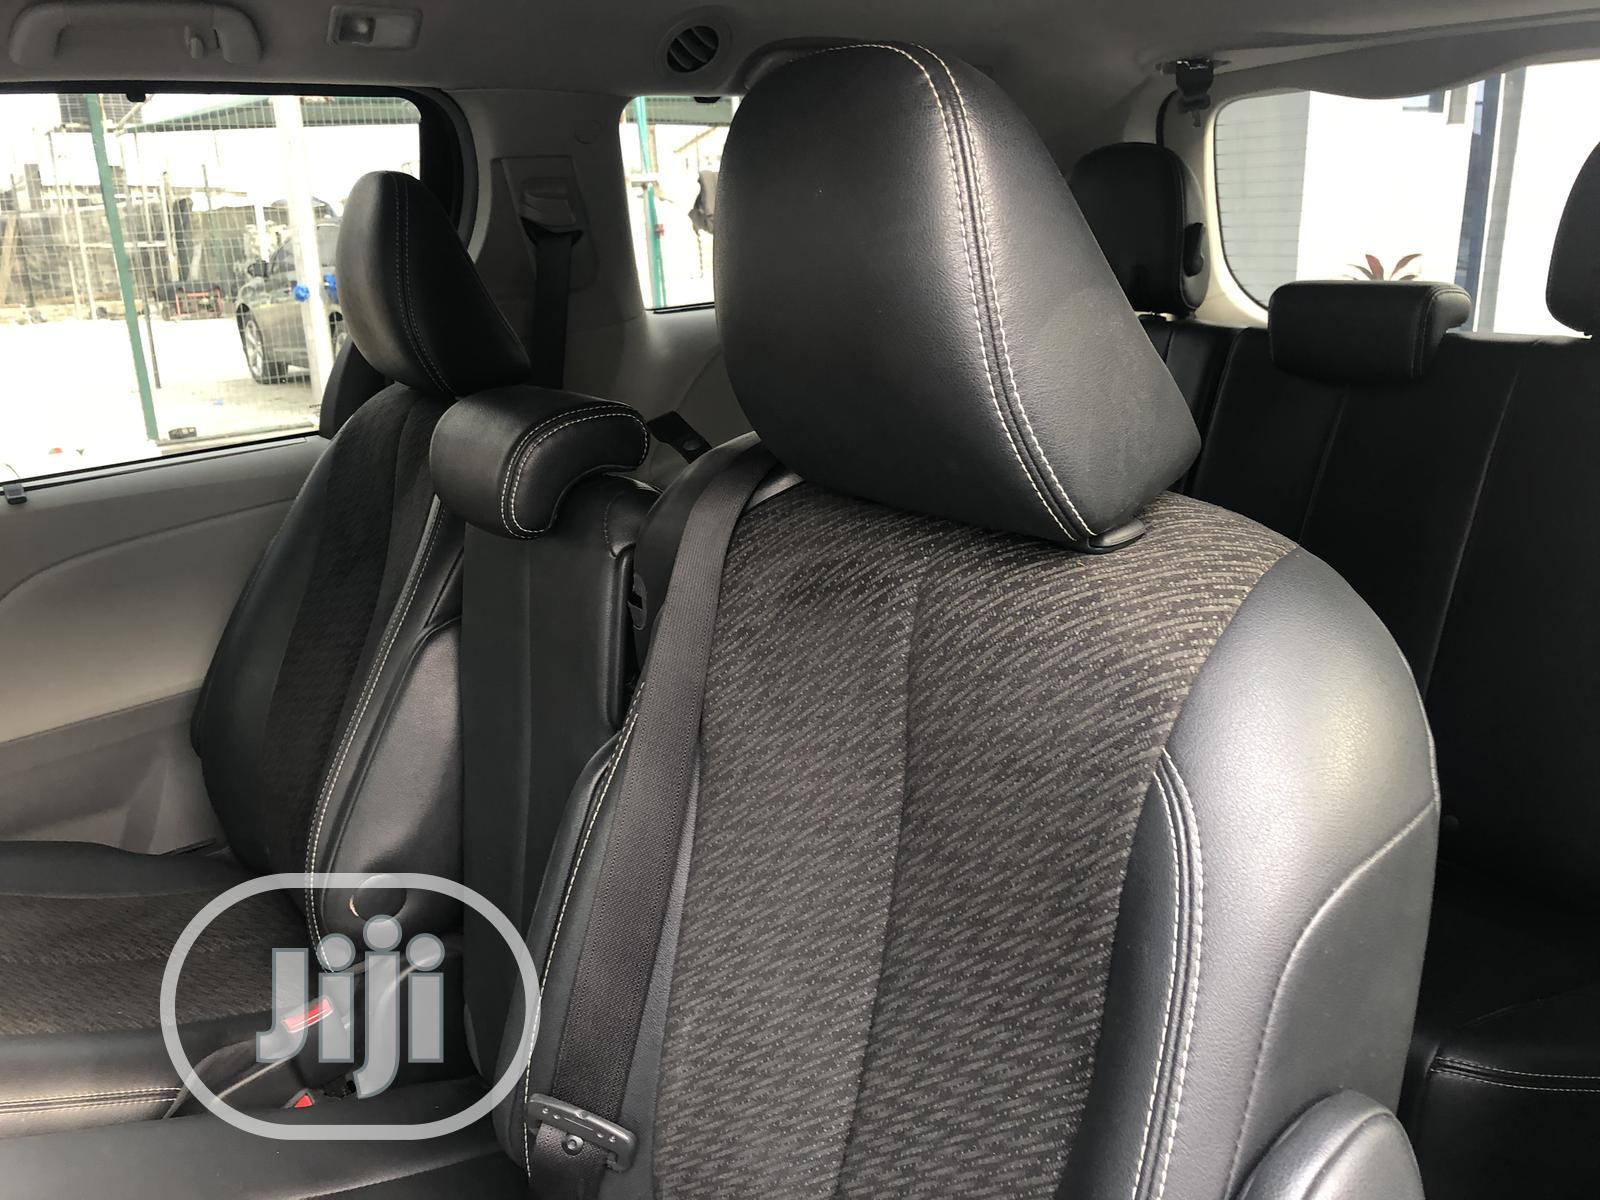 Toyota Sienna 2013 SE FWD 8-Passenger Gray | Cars for sale in Lekki, Lagos State, Nigeria